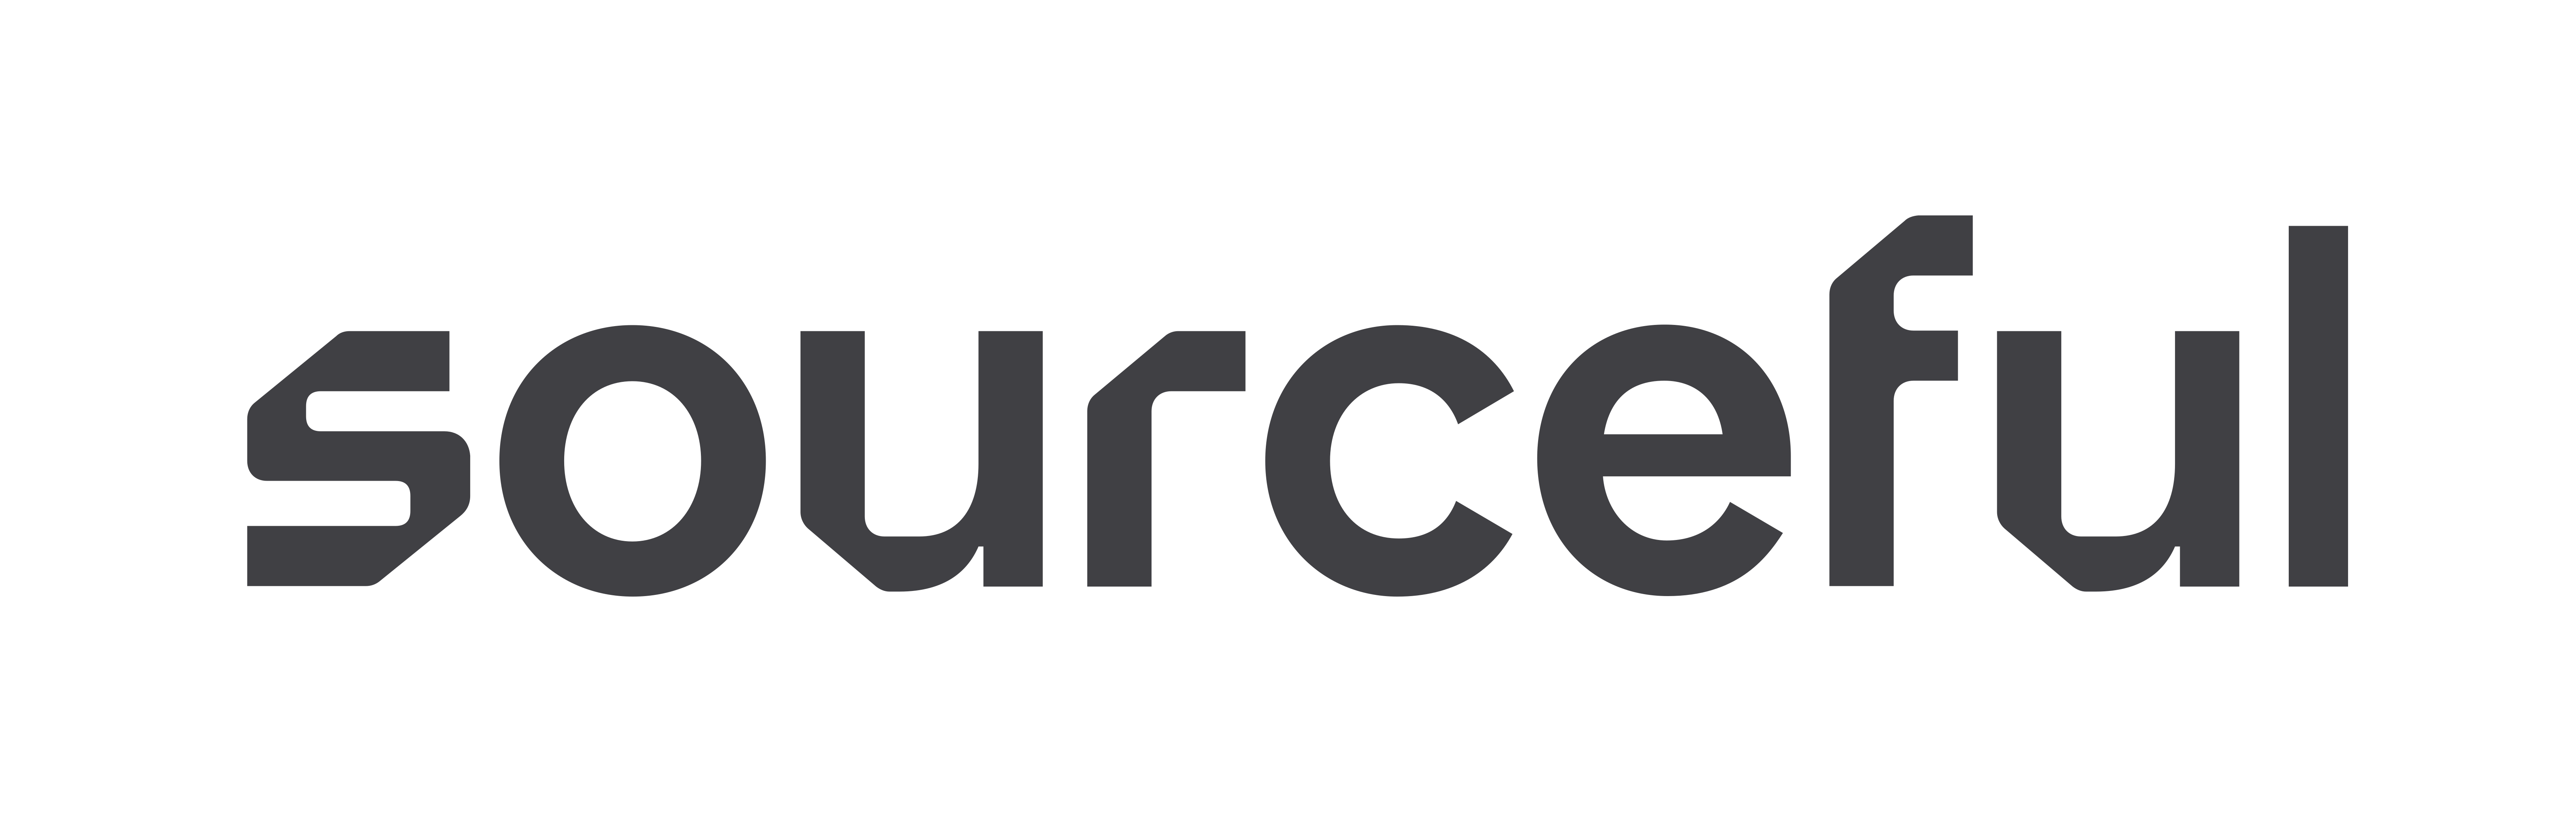 sourceful_logo